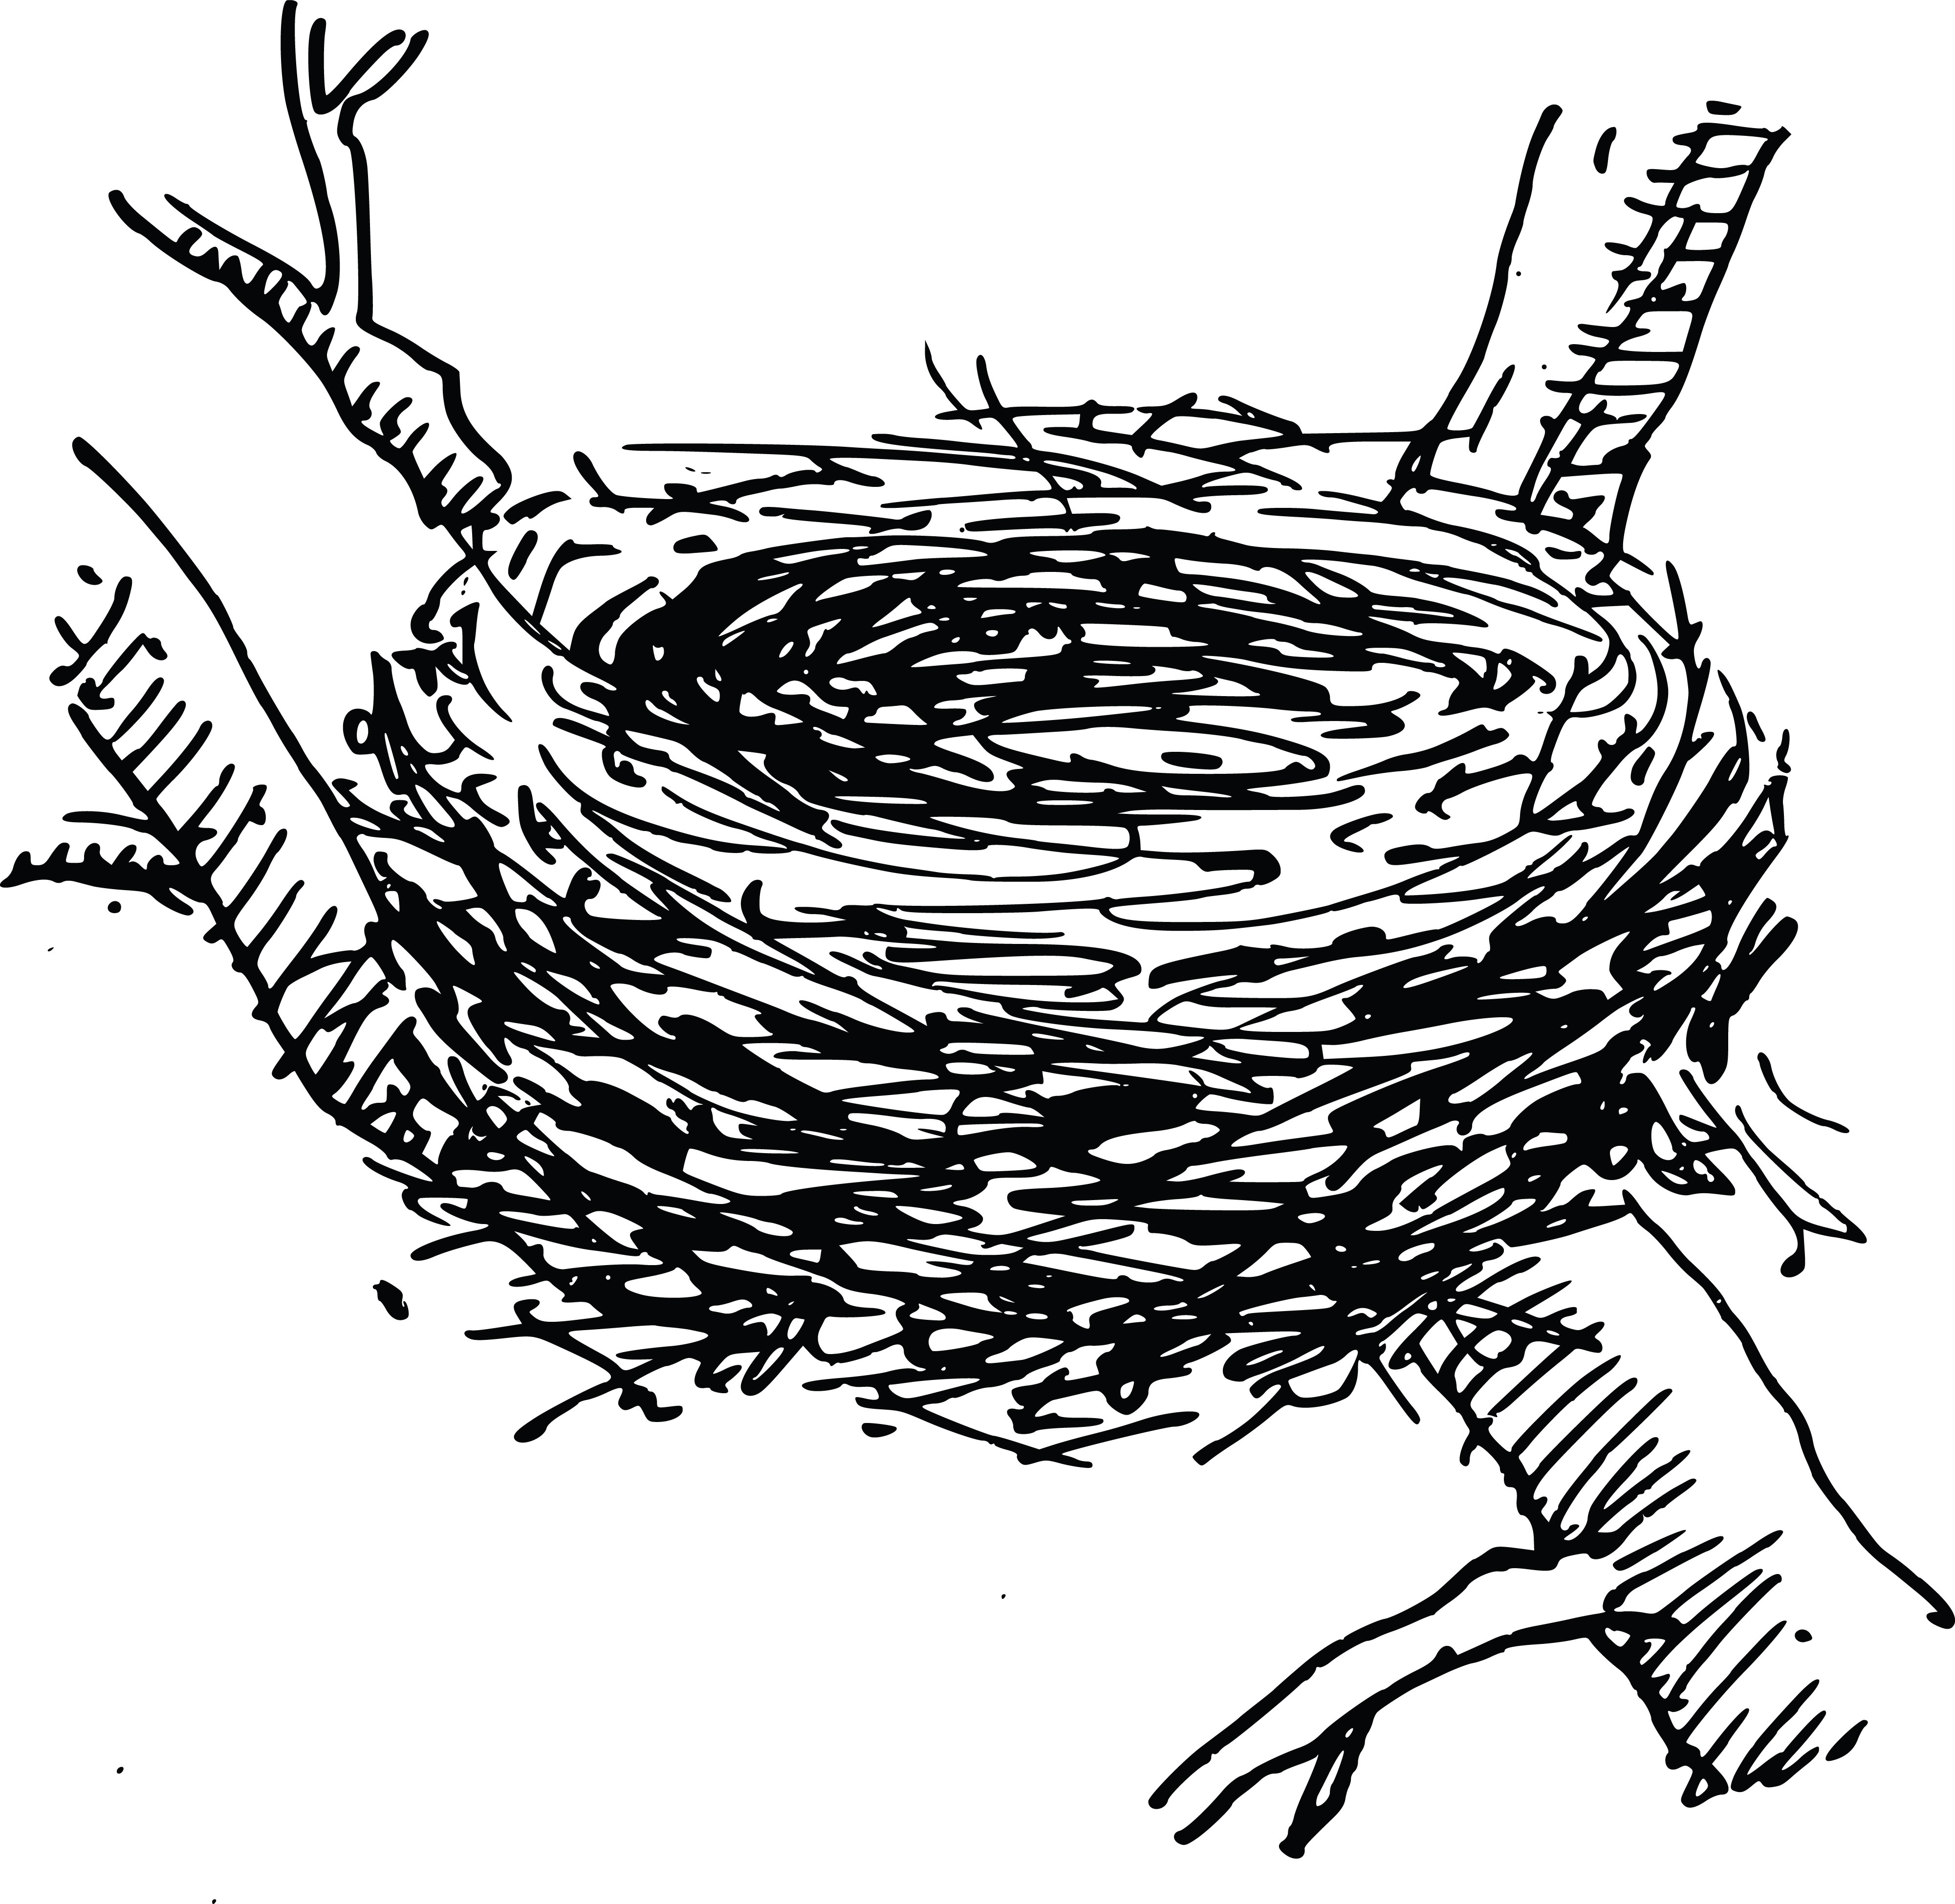 For Bird Nest Clipart Free RcLngrebi.